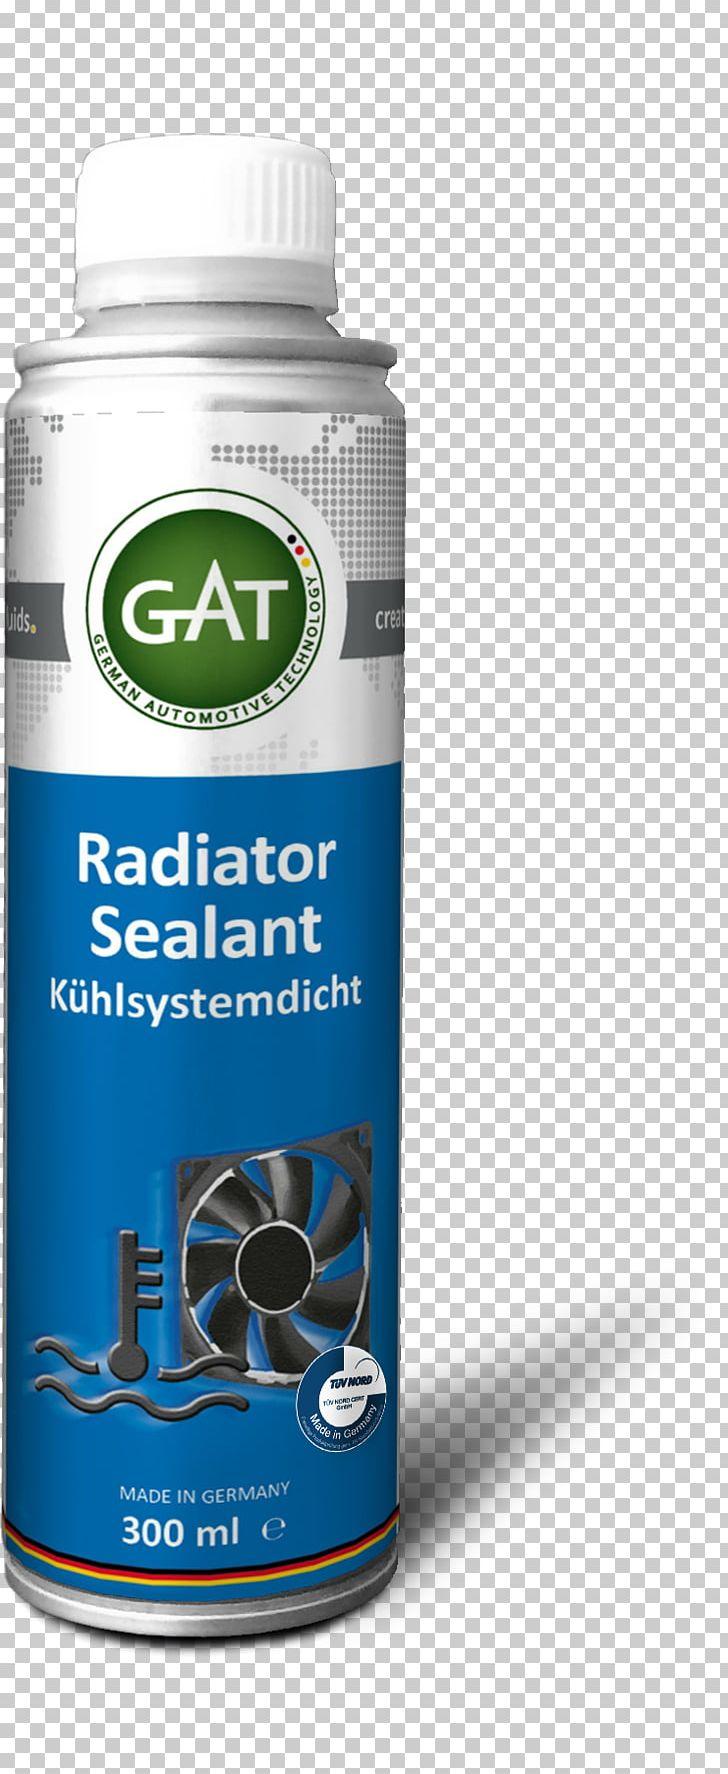 hight resolution of adal kanyag motor oil diesel engine png clipart diesel engine dietary supplement engine gasoline hardware free png download